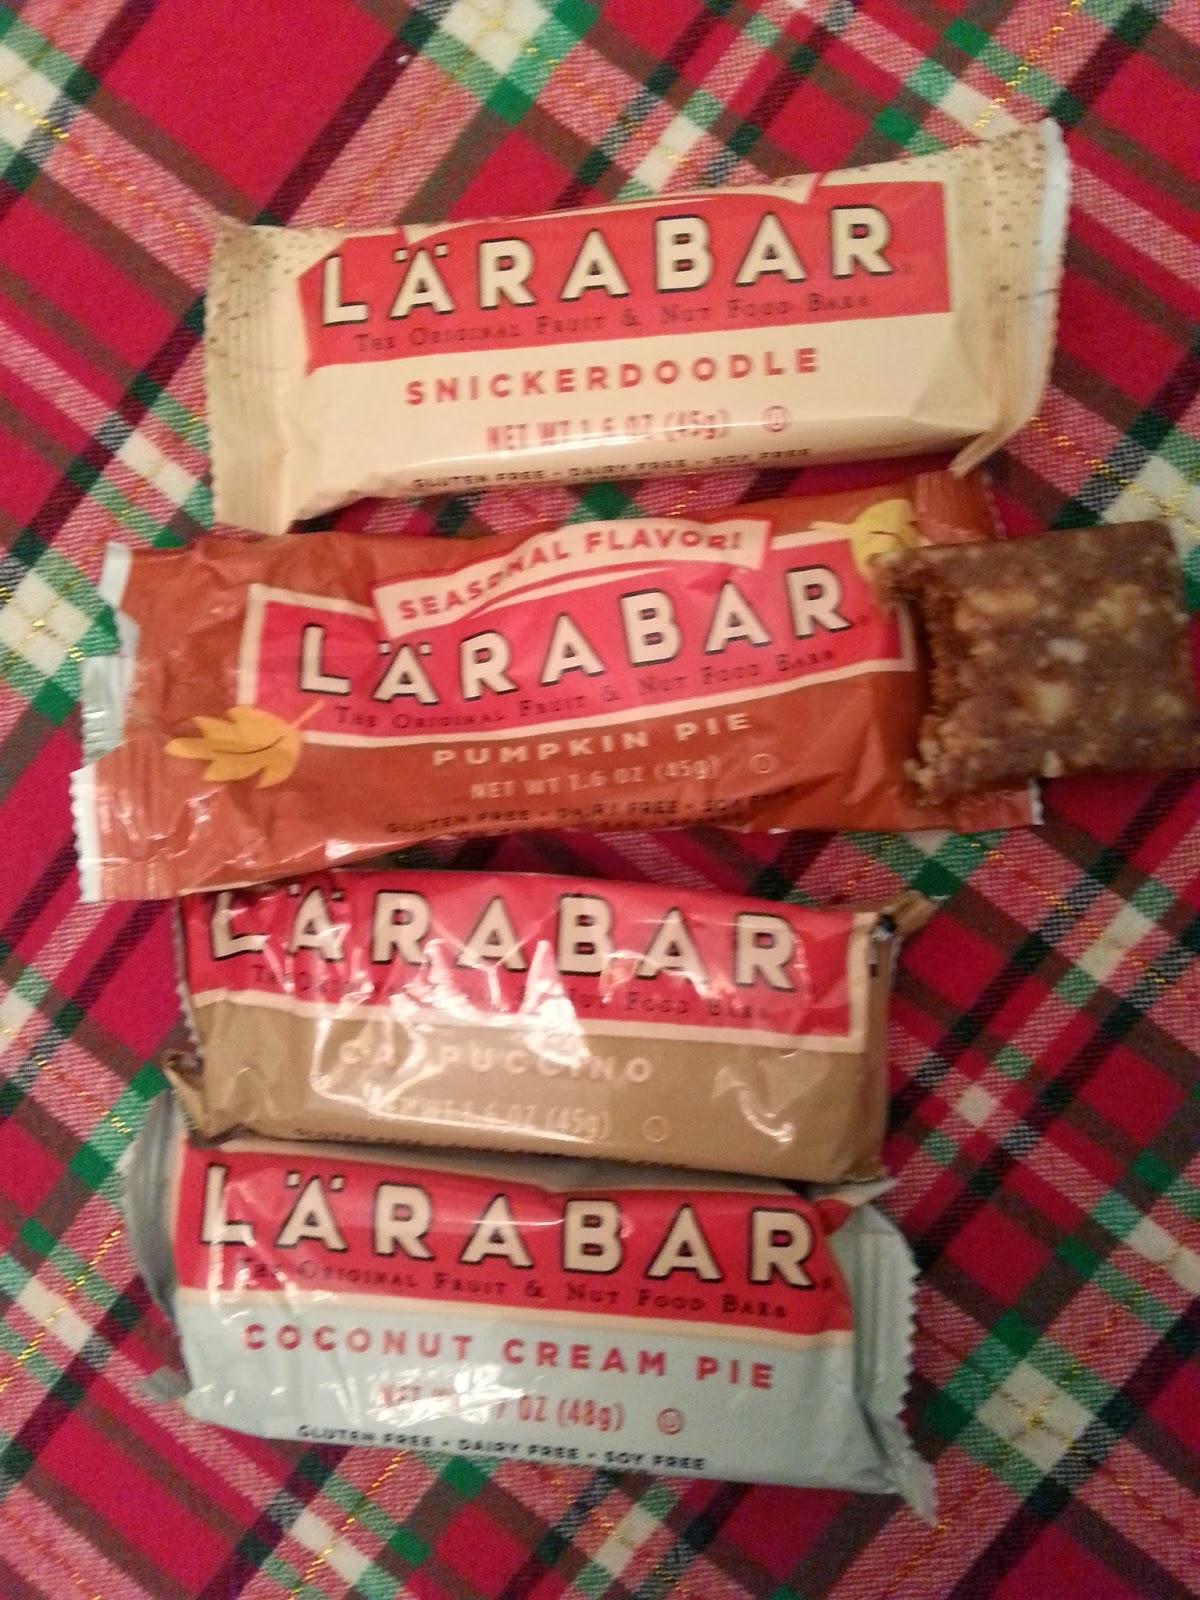 Larabarpackage1